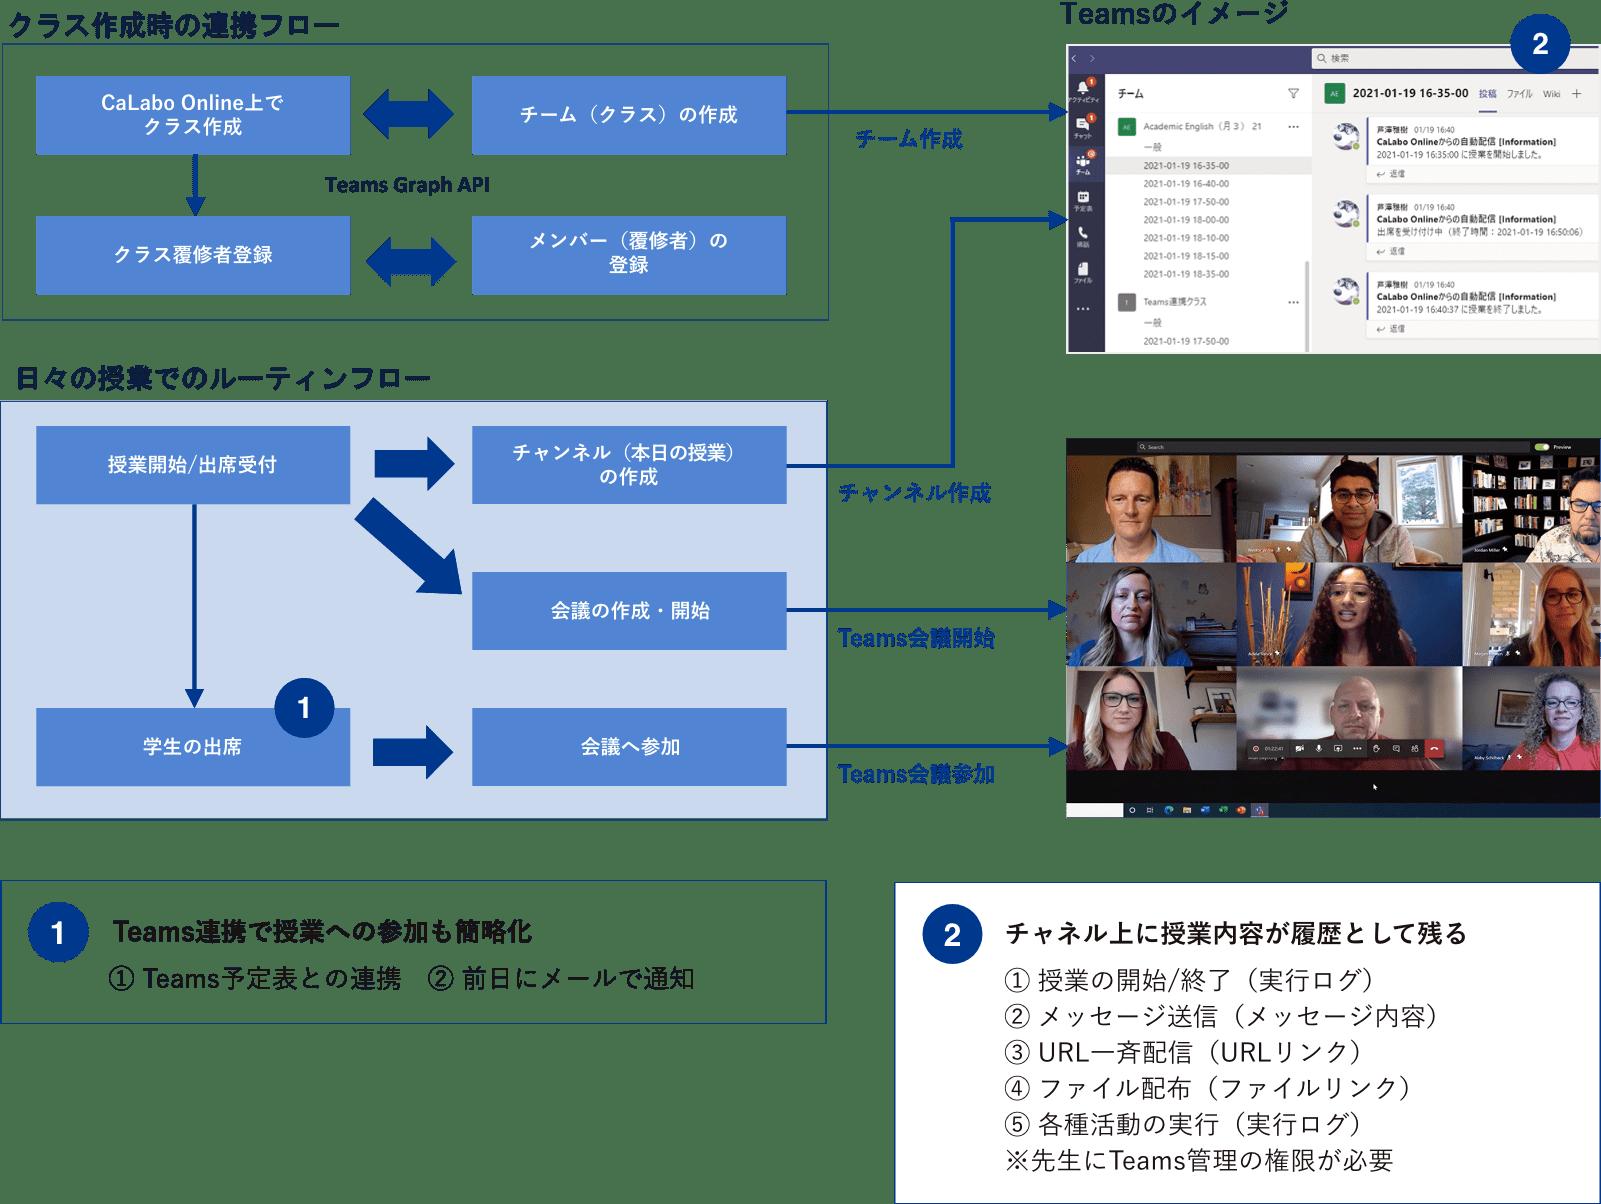 1.Teams連携で授業への参加も簡略化、2.チャネル上に授業内容が履歴として残る